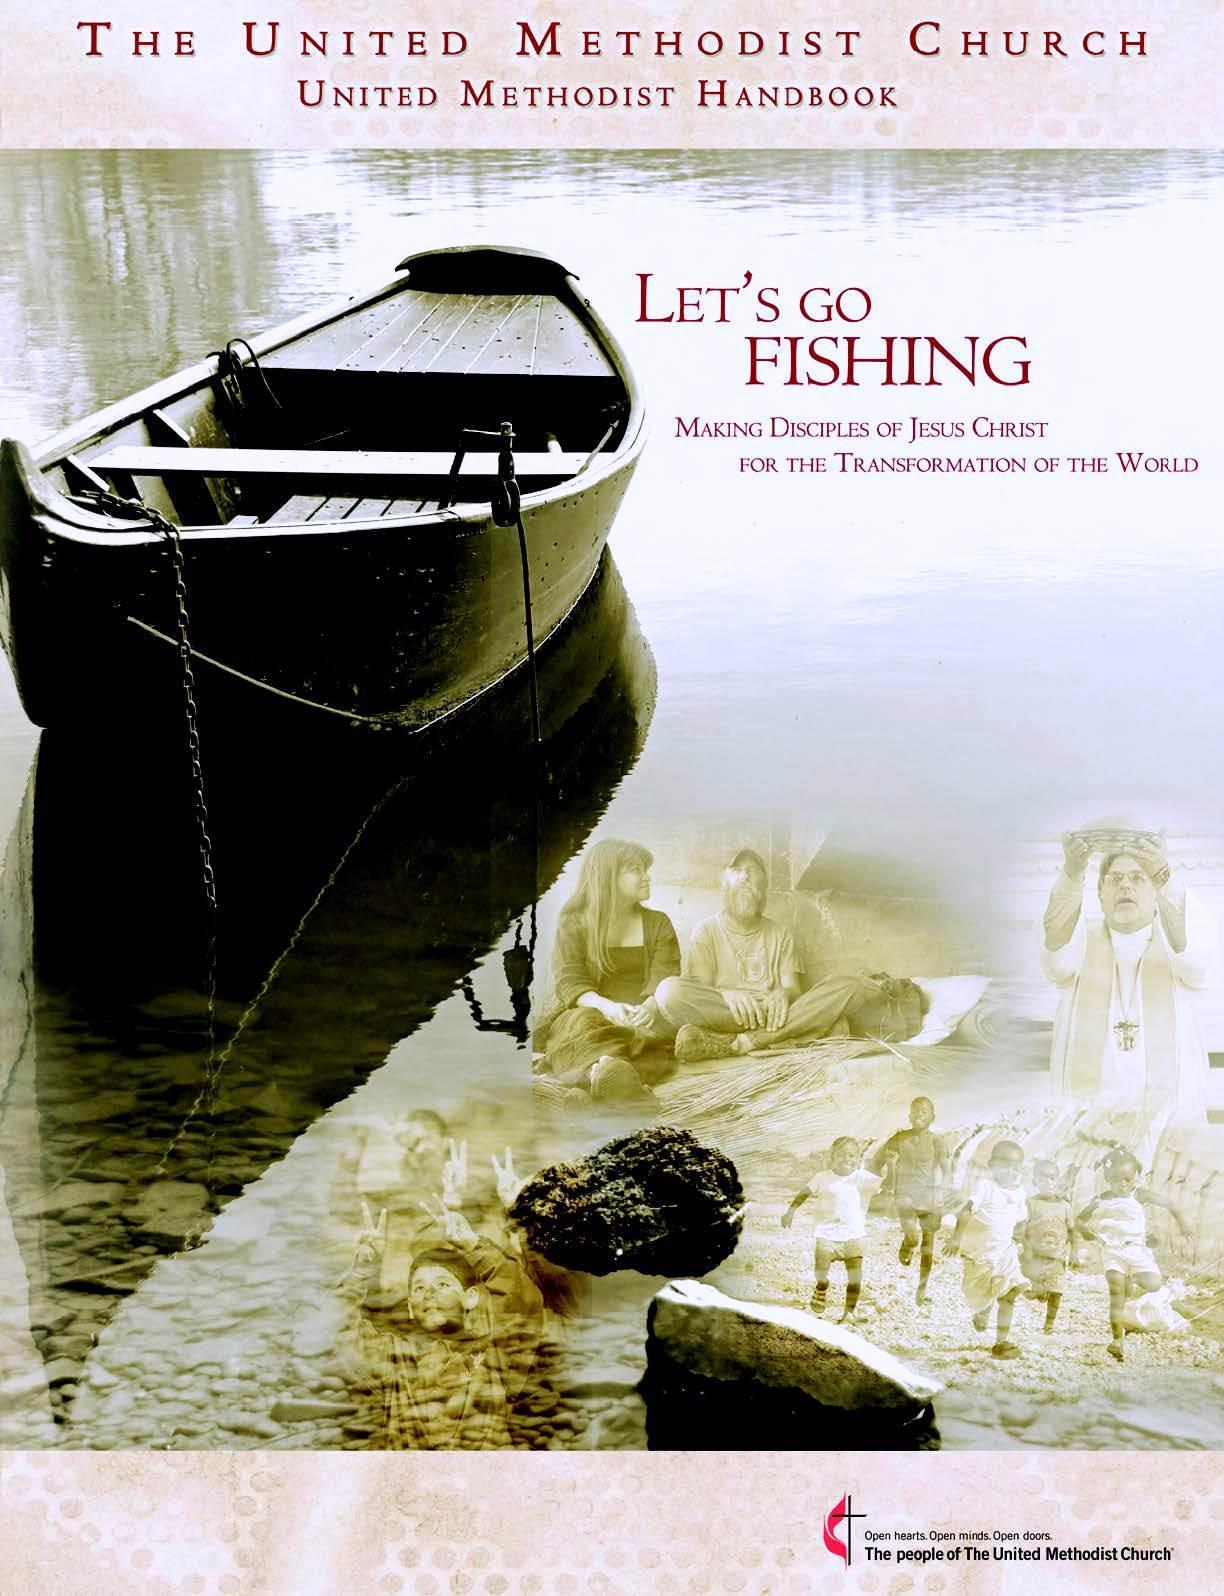 Mount zion united methodist church umc handbook for Lets go fishing